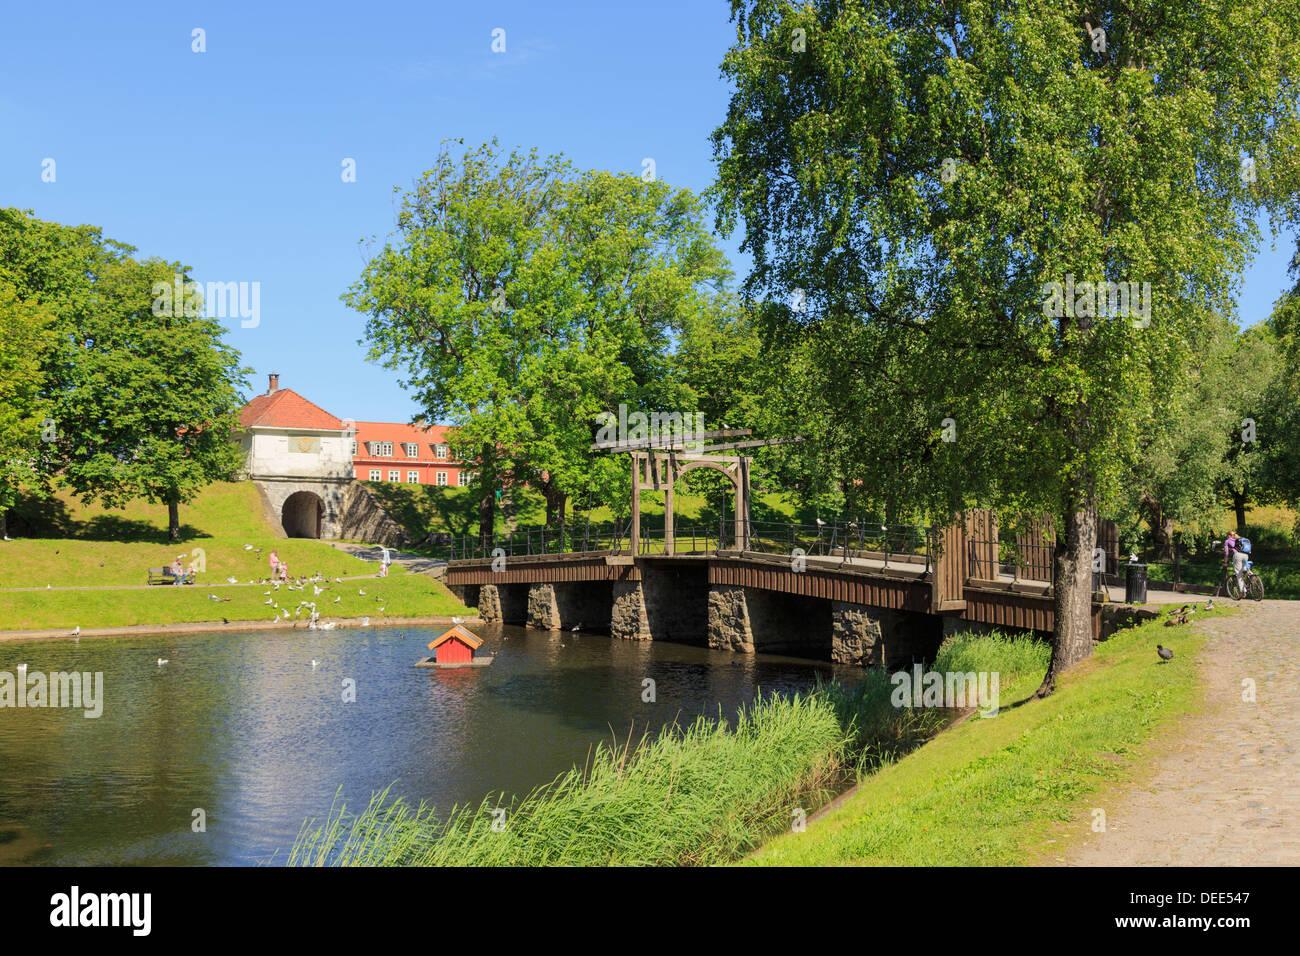 Old wooden drawbridge across moat at entrance to old fortified town of Gamlebyen, Fredrikstad, Ostfold, Norway, Scandinavia - Stock Image